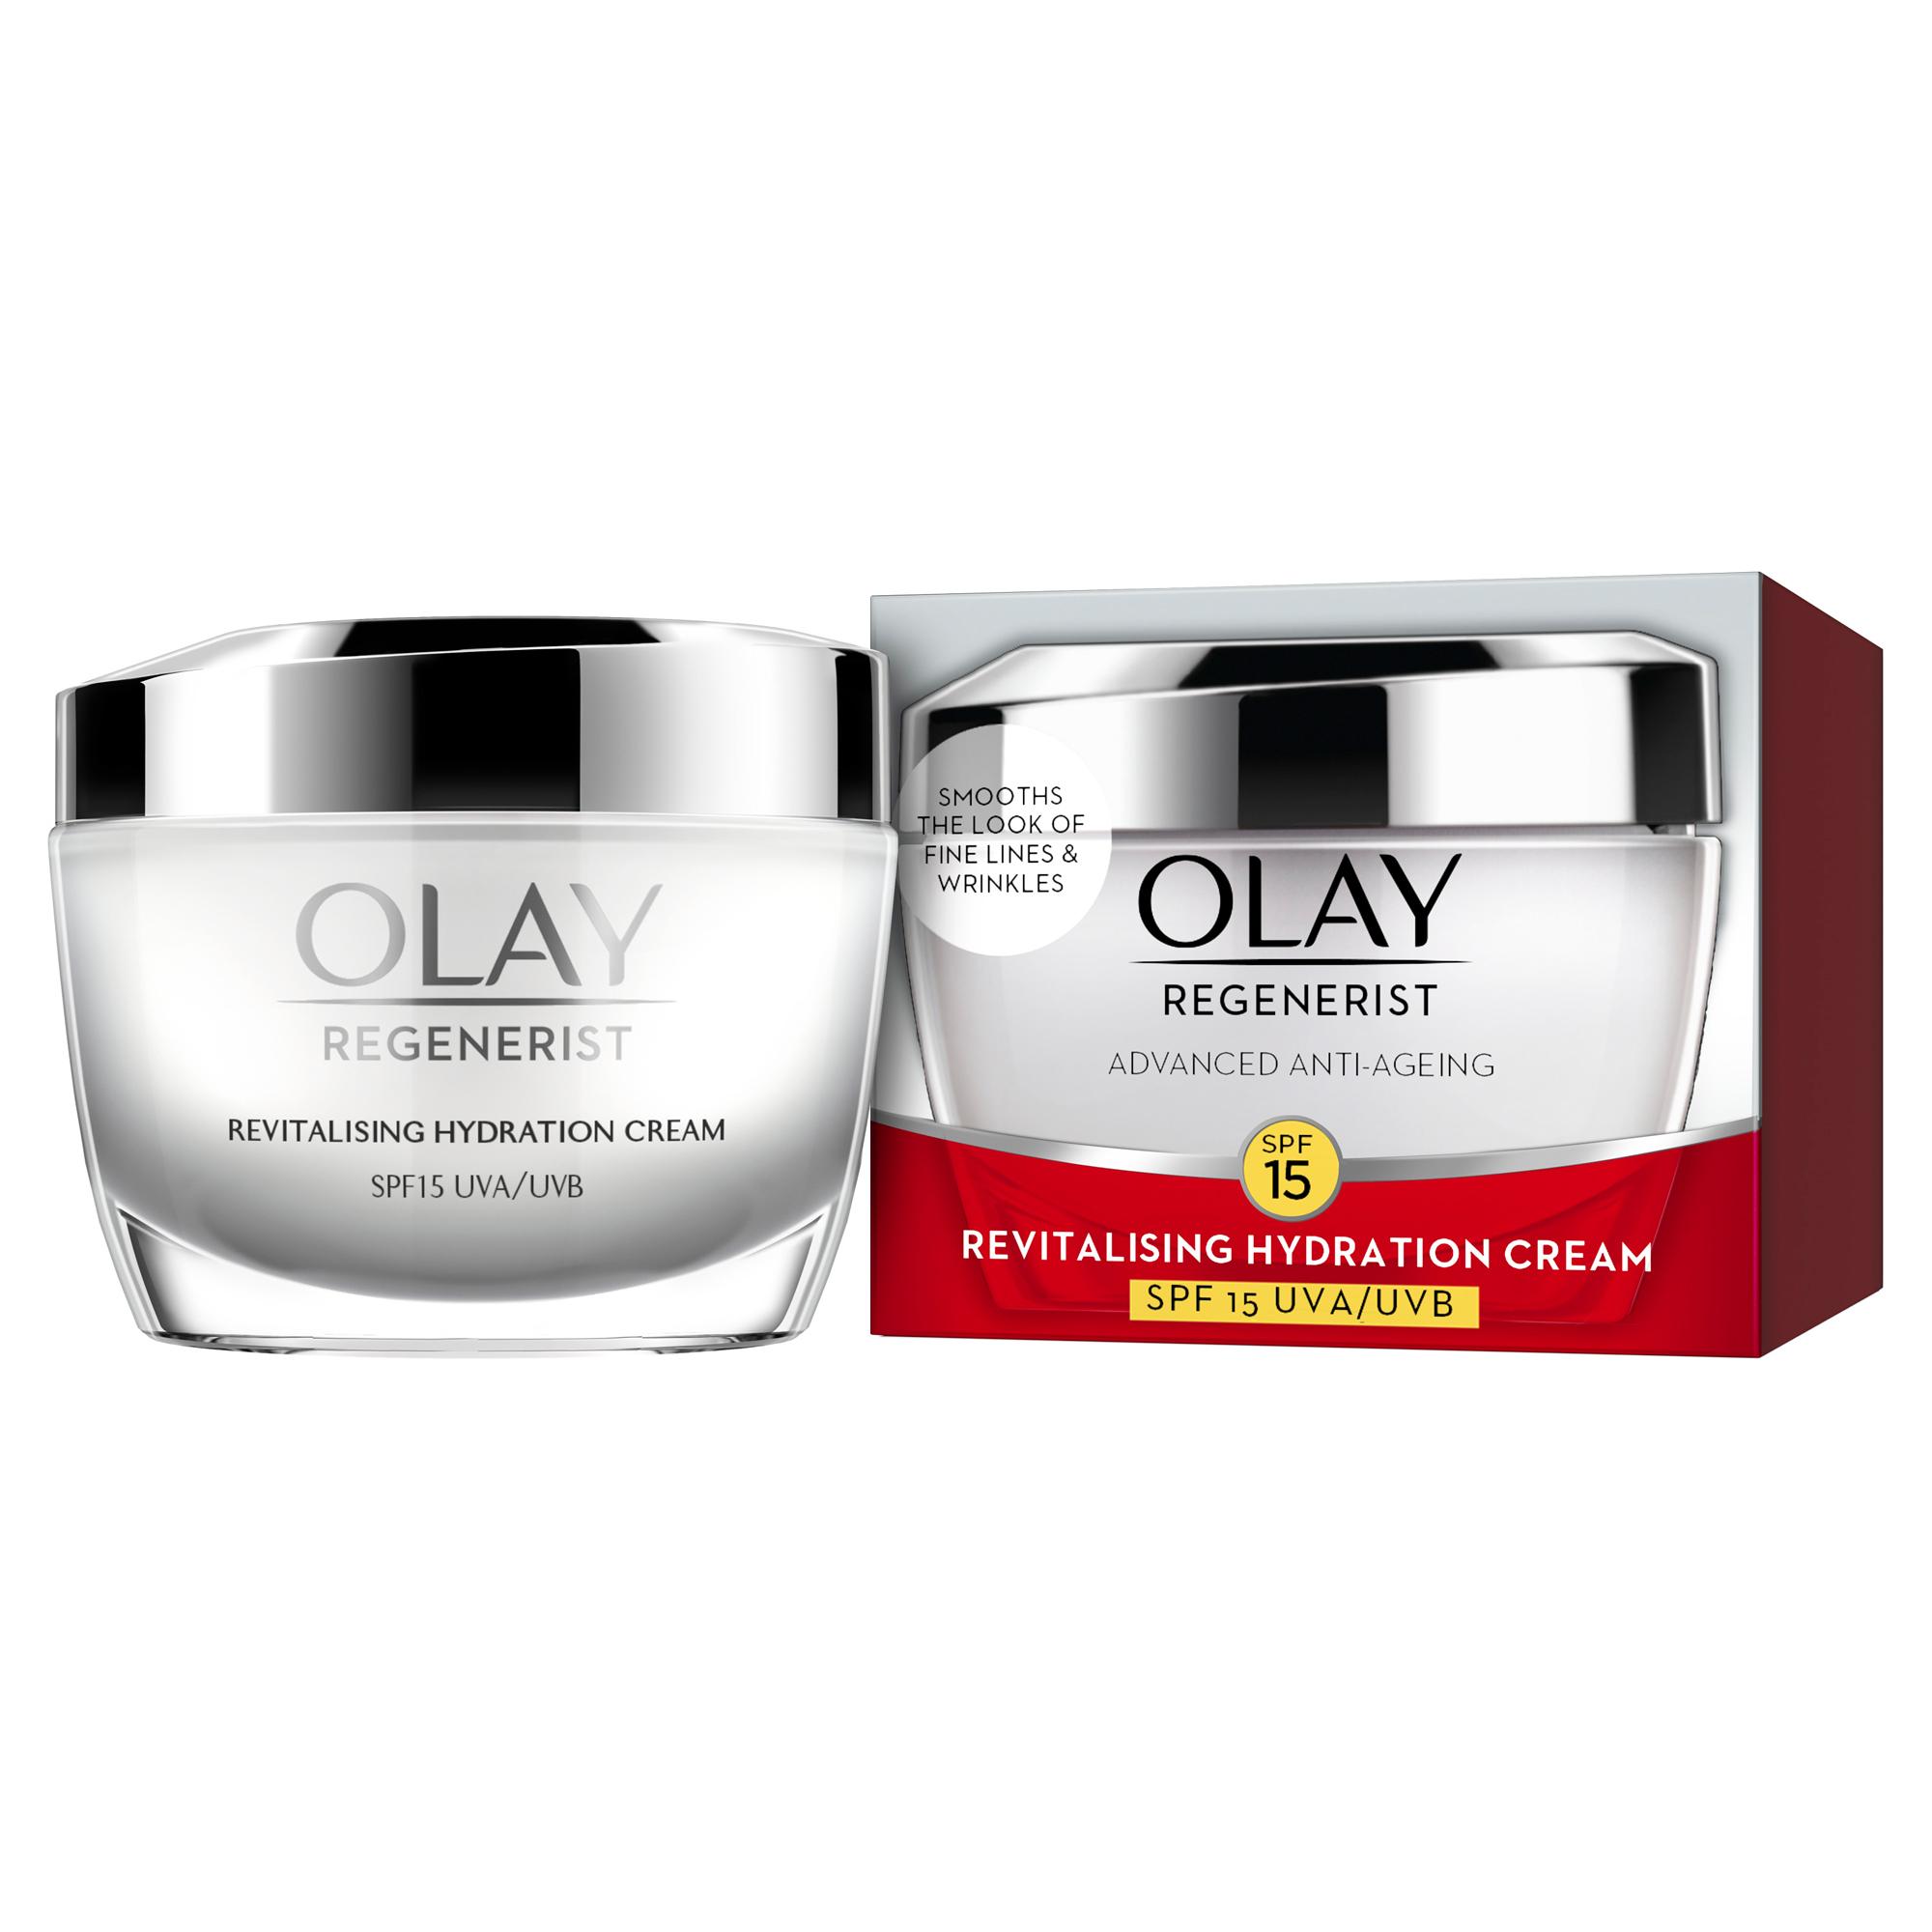 Olay Cream SPF 15: Regenerist Revitalizing Hydration Cream